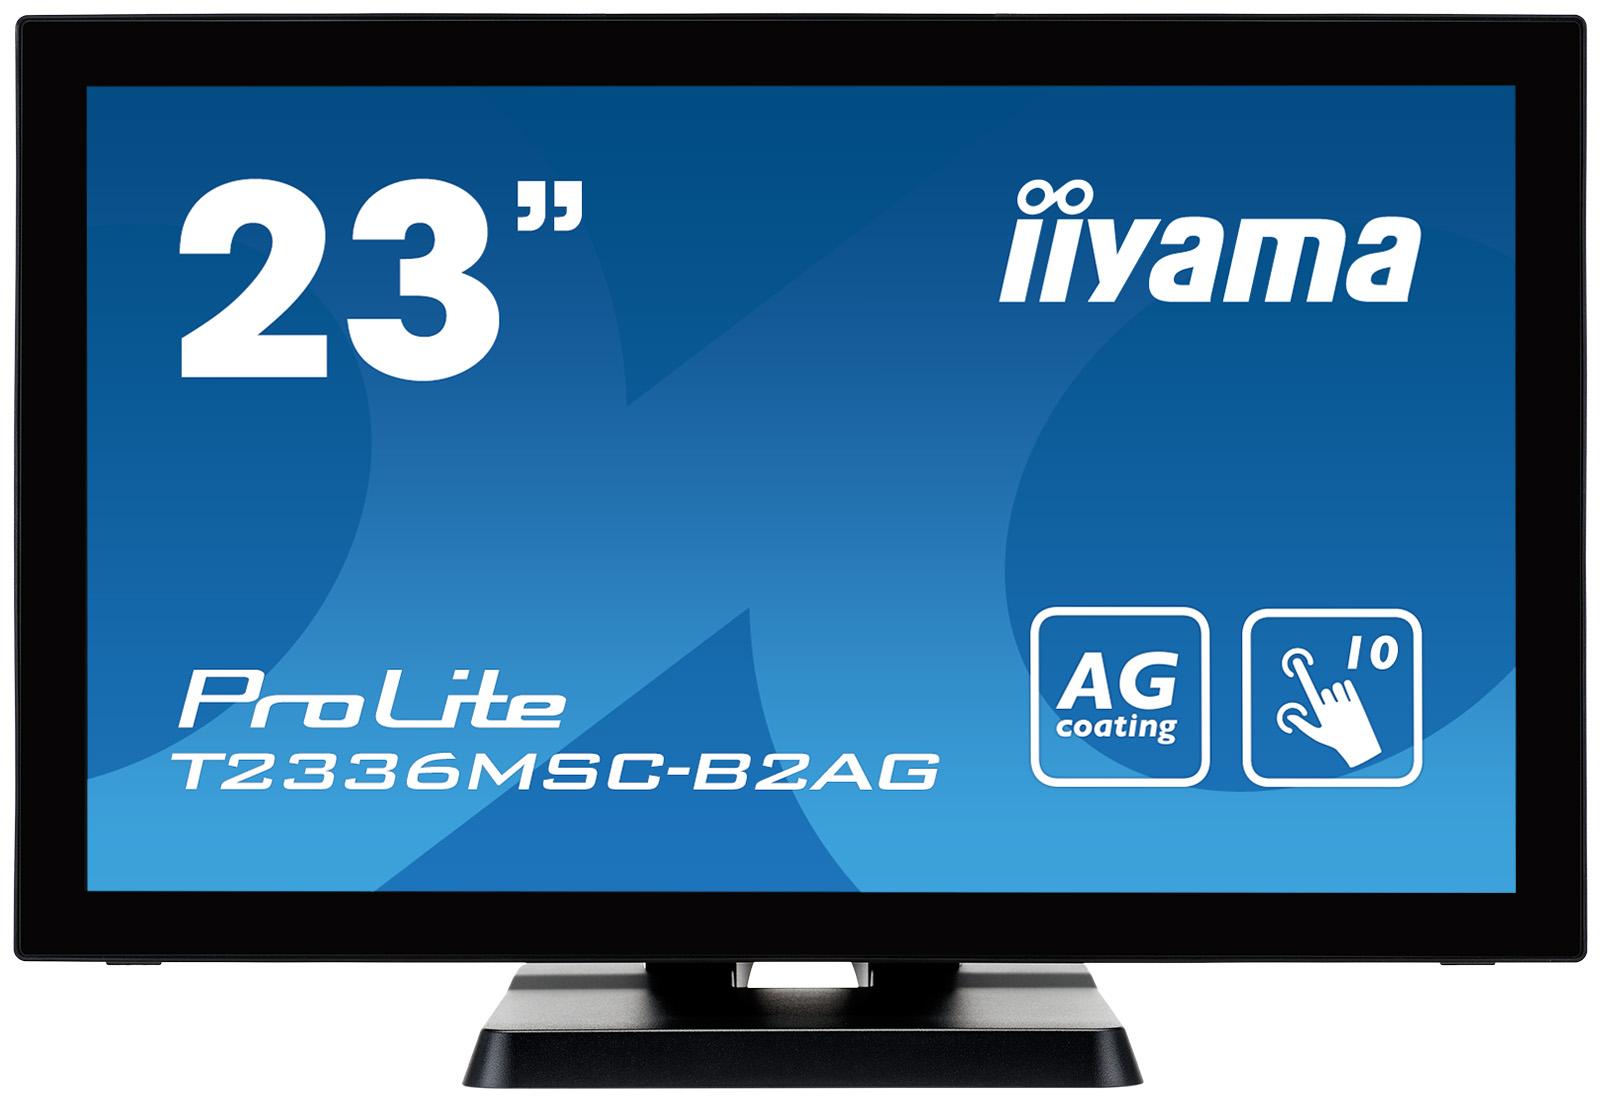 "23"" LCD iiyama T2336MSC-B2AG - multidotekový, FullHD, IPS, kapacitní, USB, antilesklý displej"